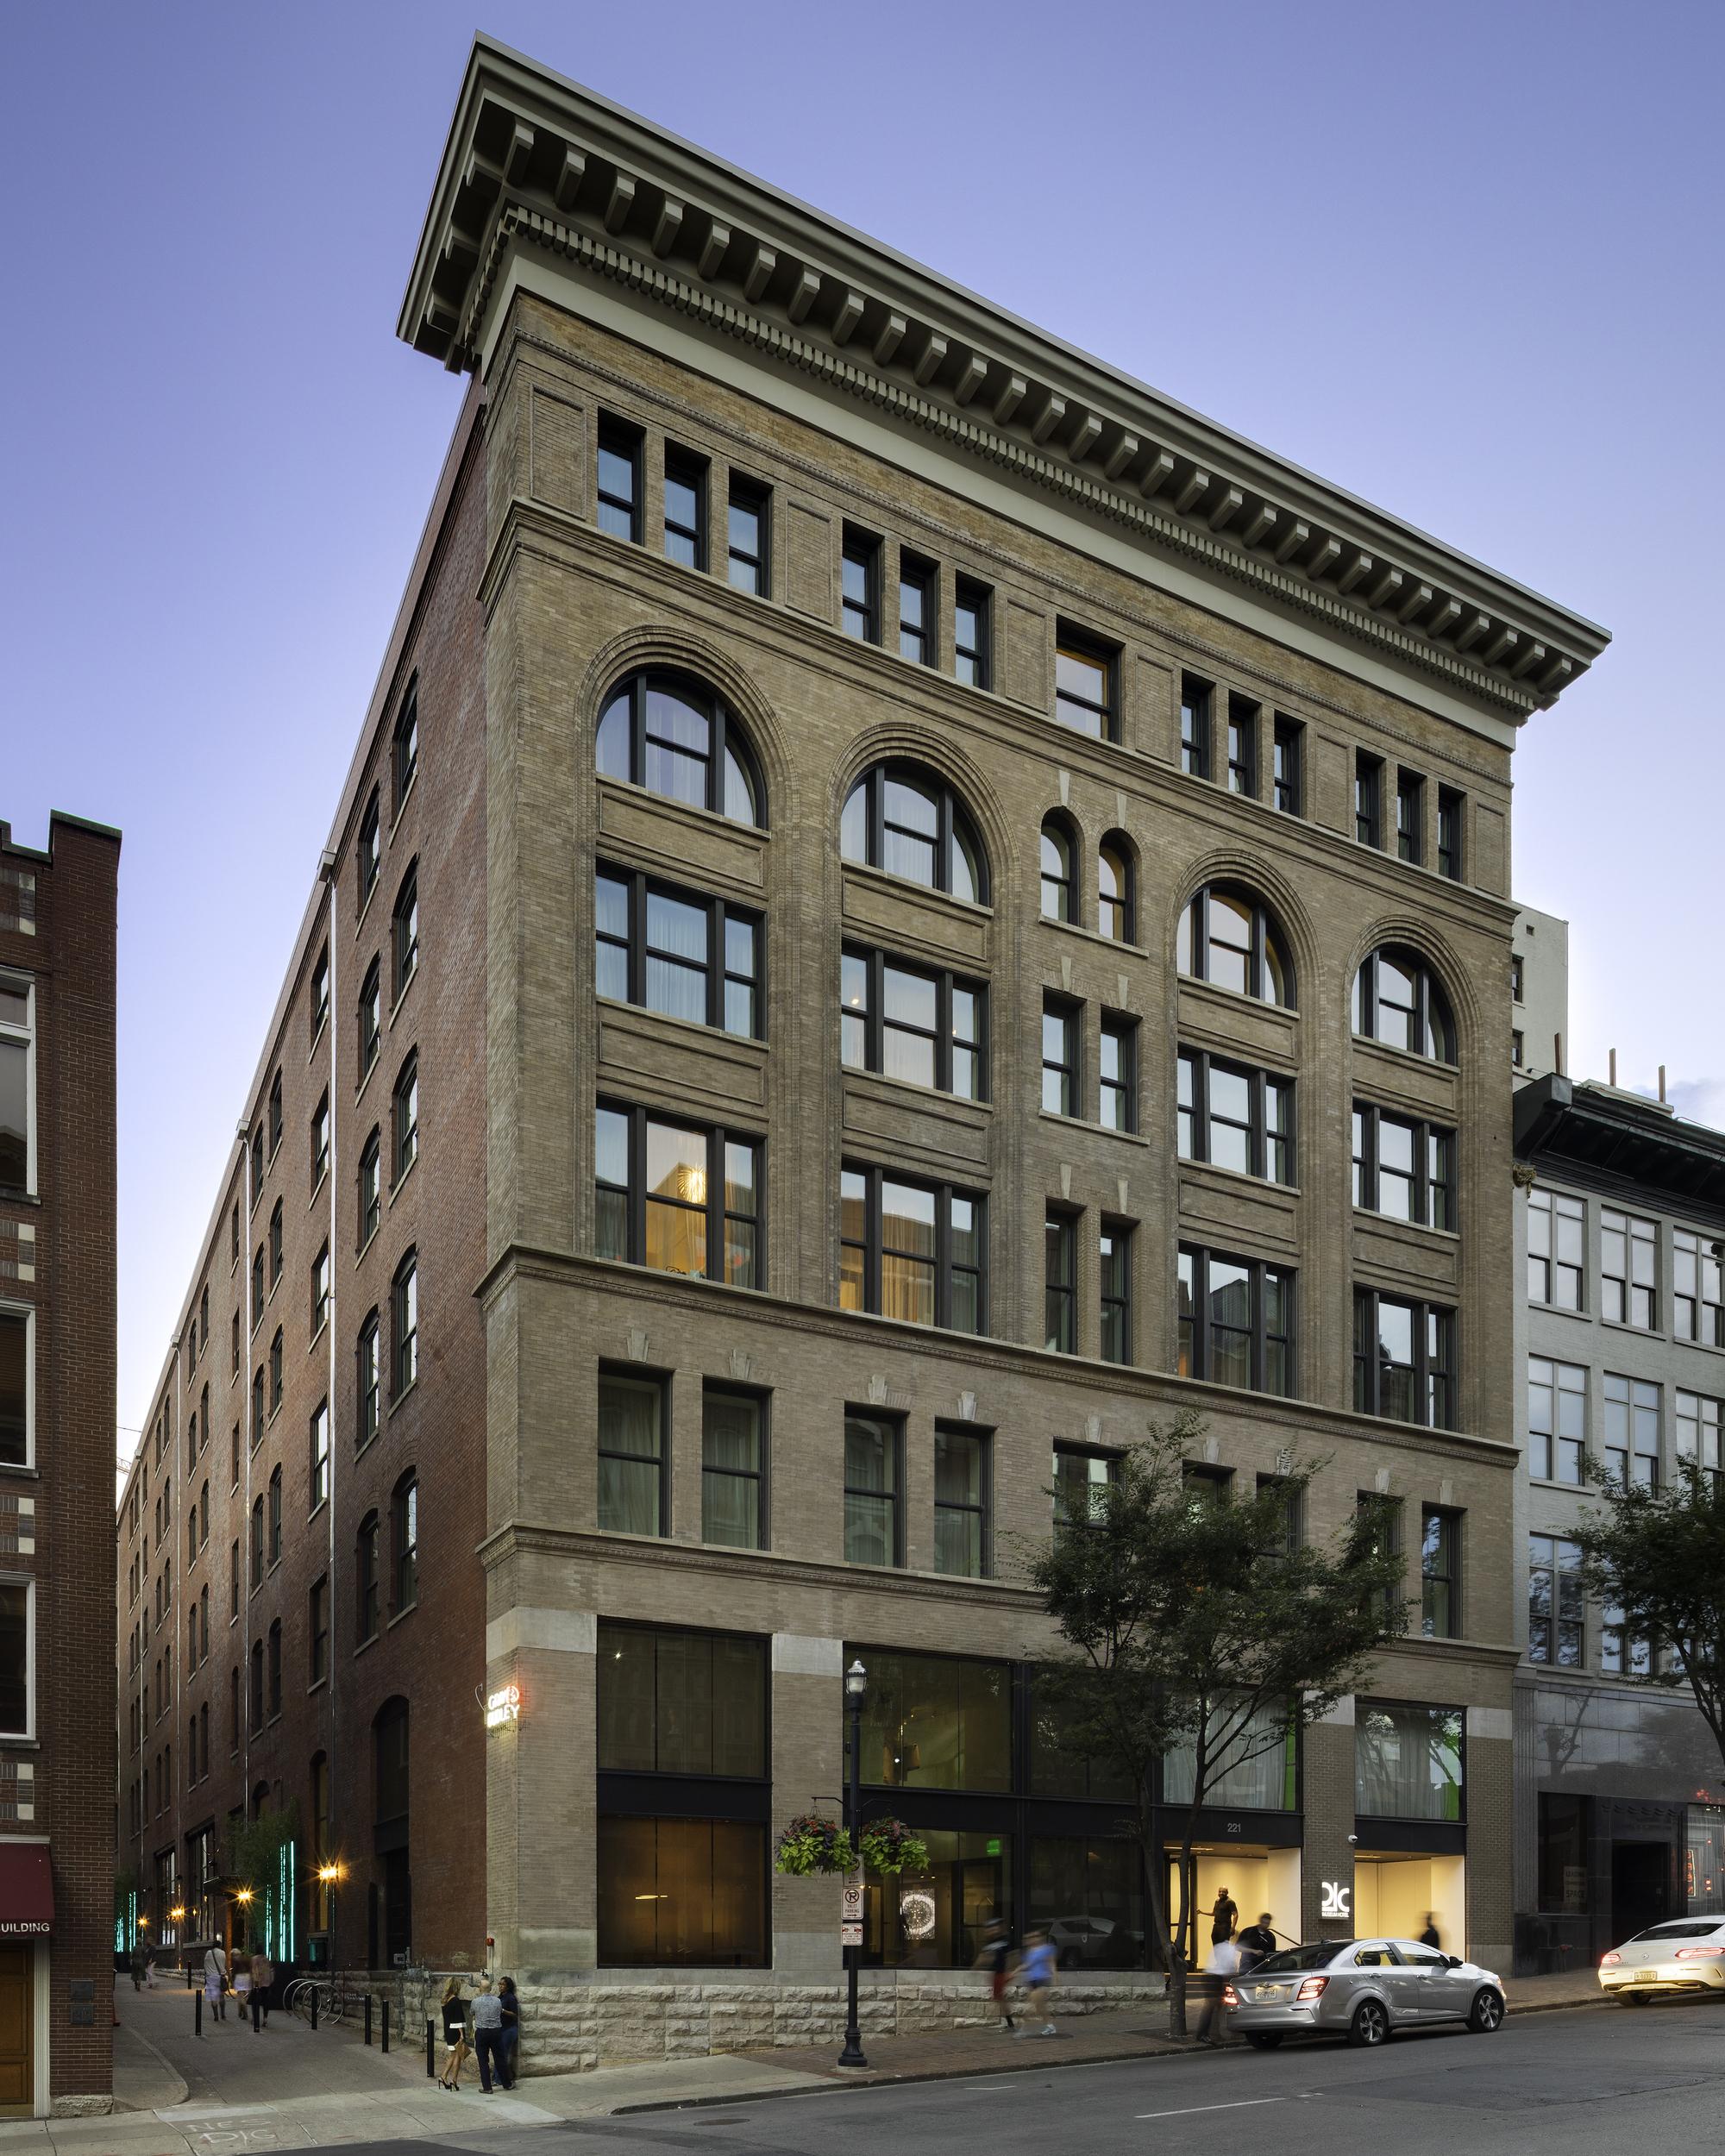 Nashville Architects: 21c Museum Hotel Nashville / Deborah Berke Partners